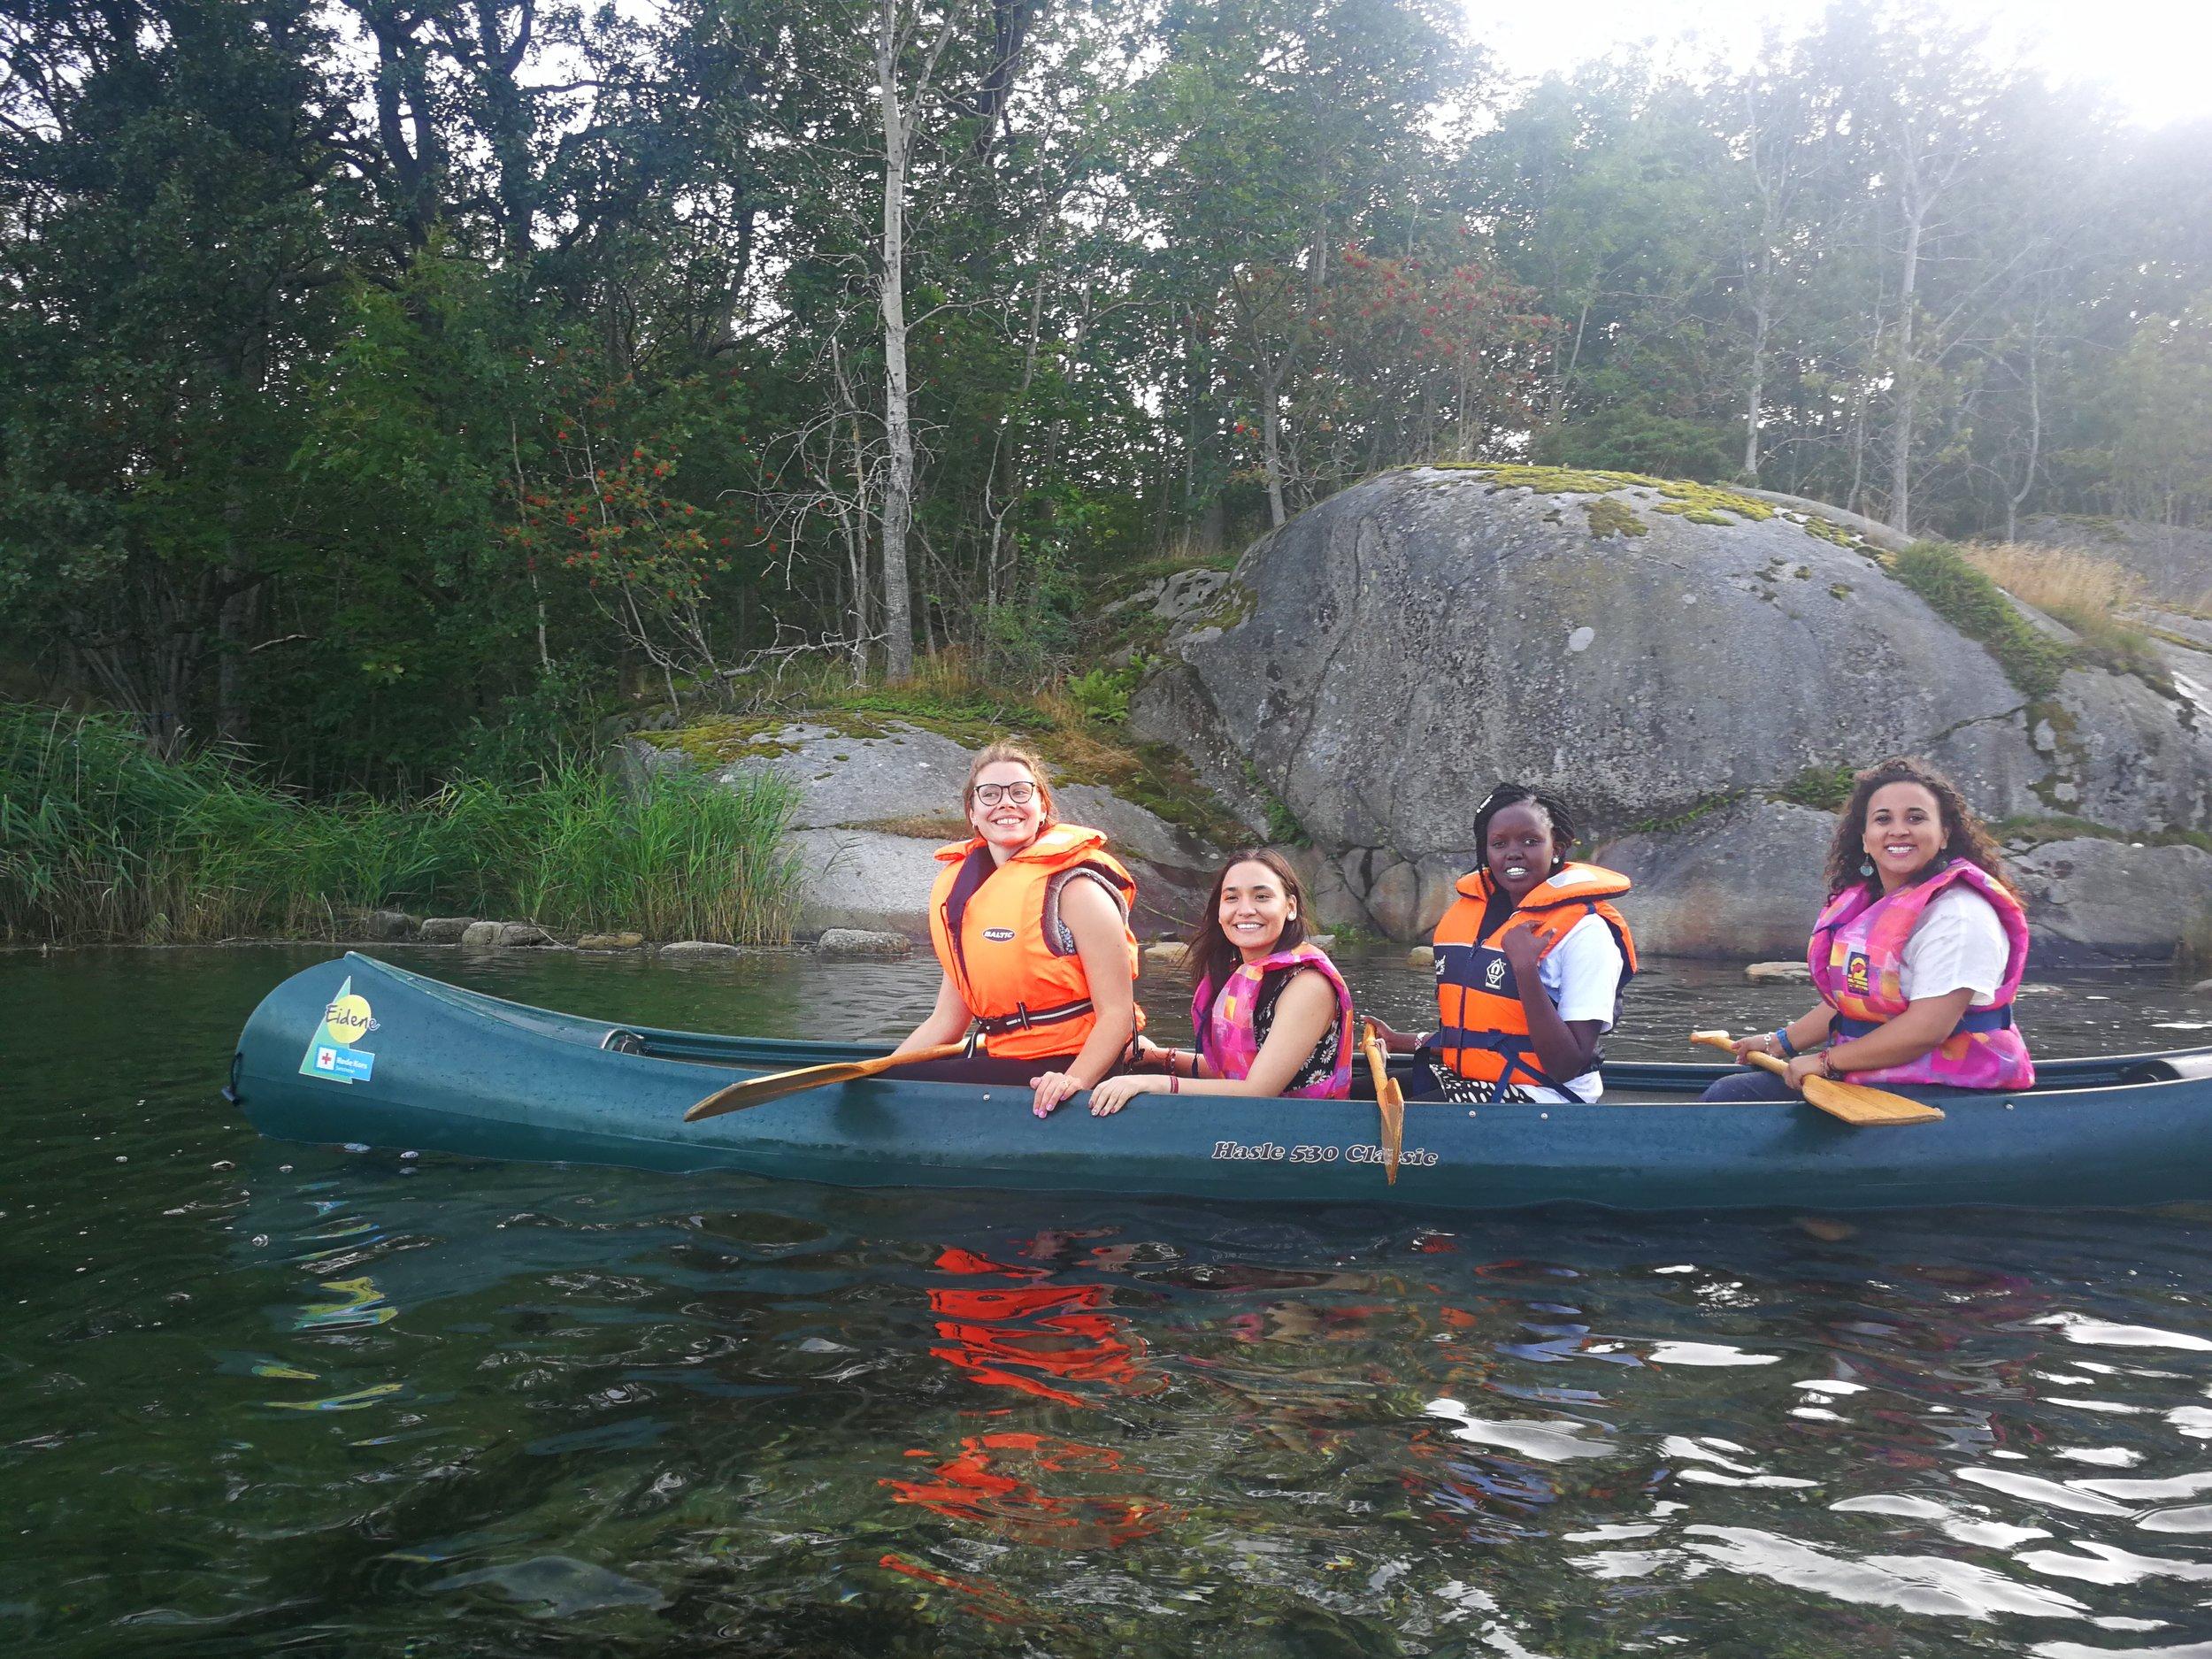 Delegates canoeing at the lake in Eidene. Photo by Annie Carolina Tellez .